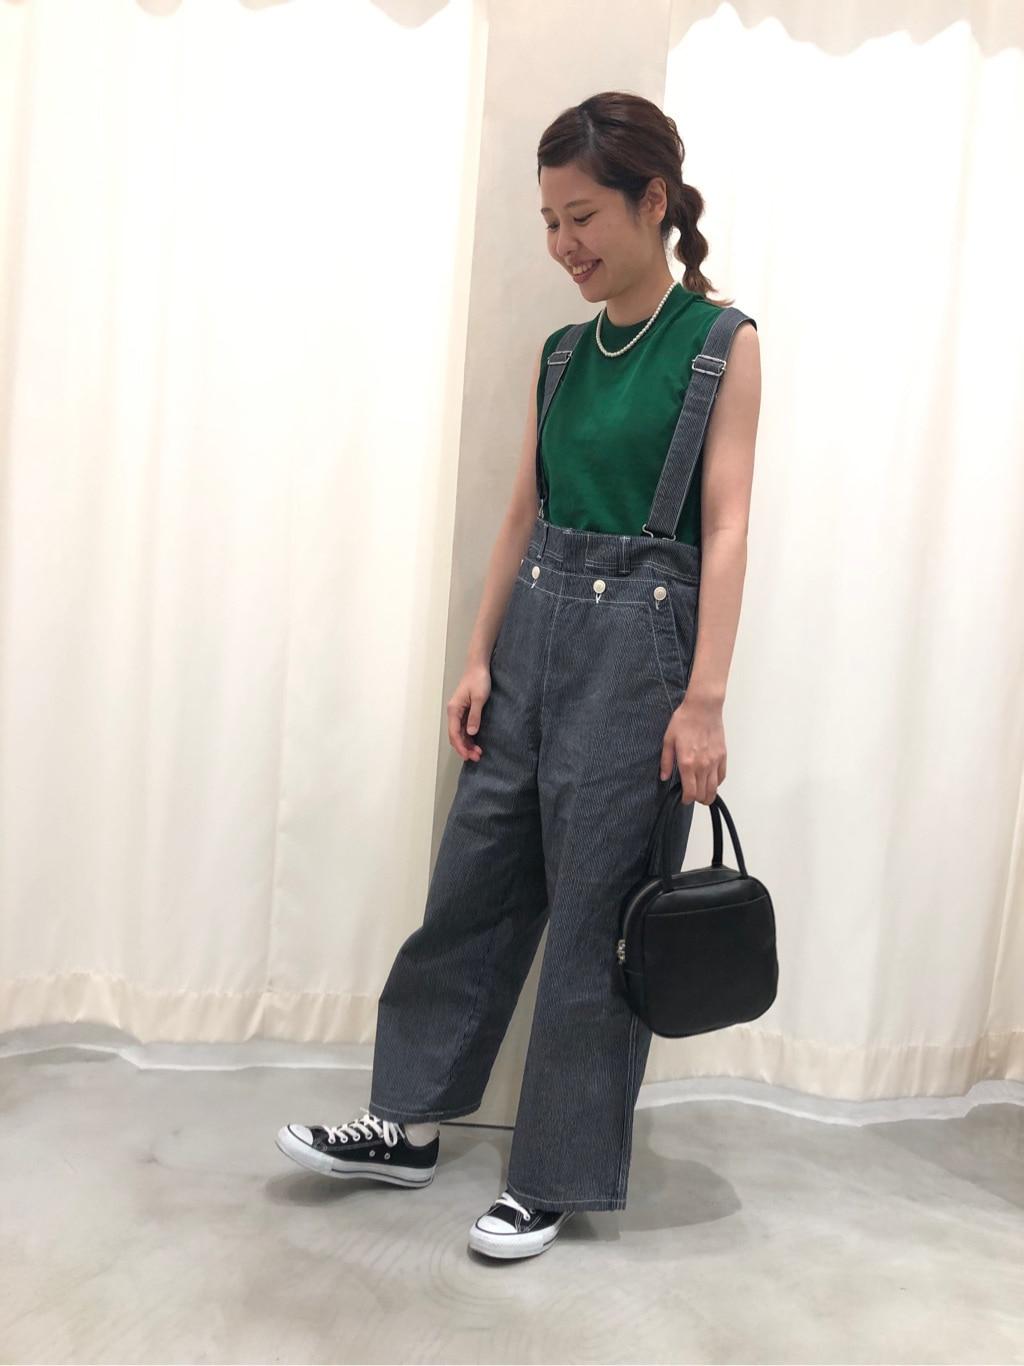 CHILD WOMAN , PAR ICI 東京スカイツリータウン・ソラマチ 2020.07.22